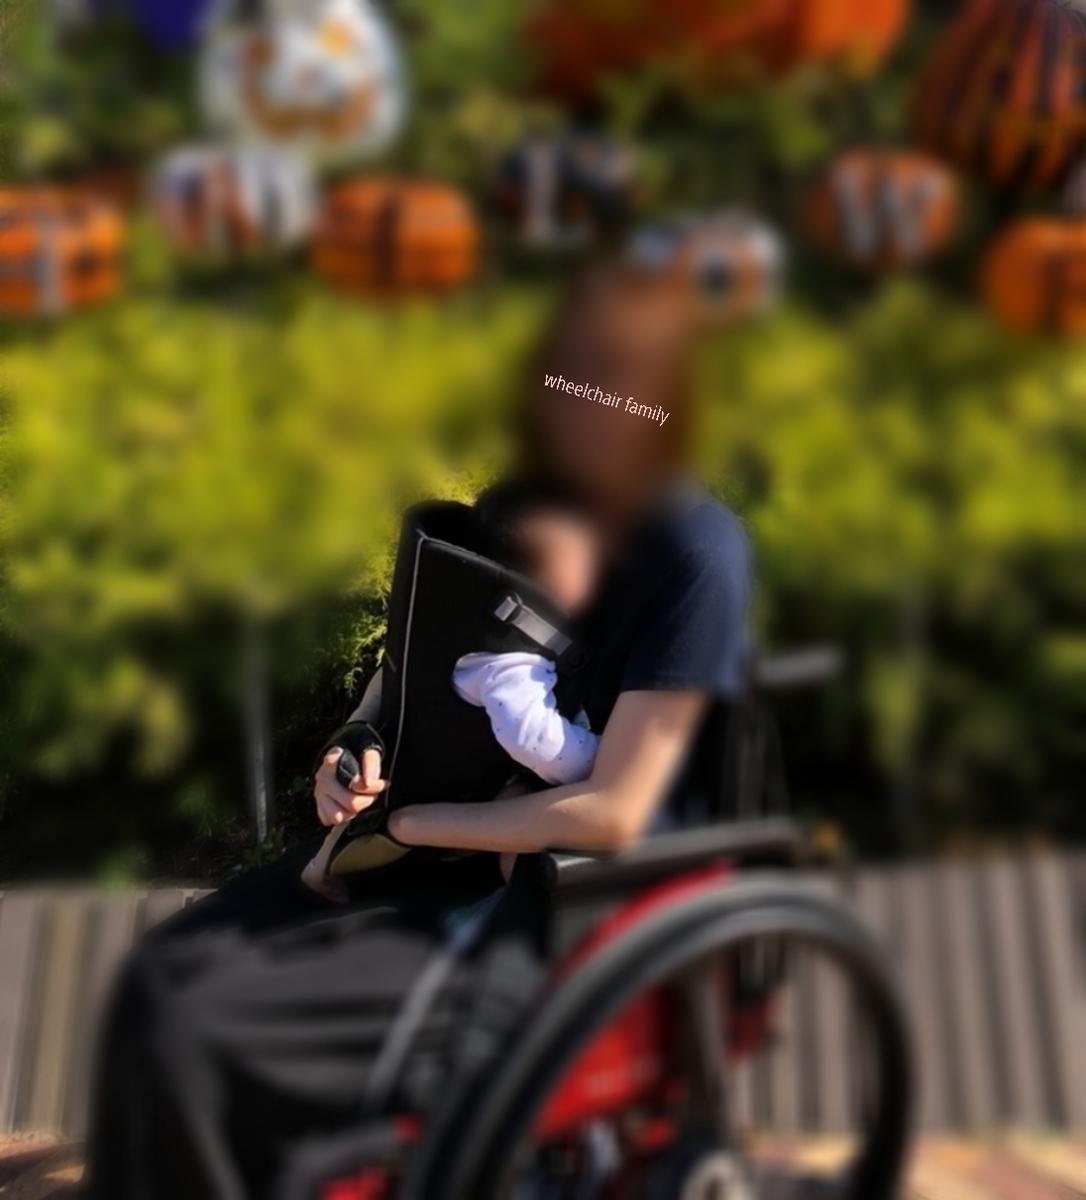 f:id:WheelchairFamily:20190729163223j:plain